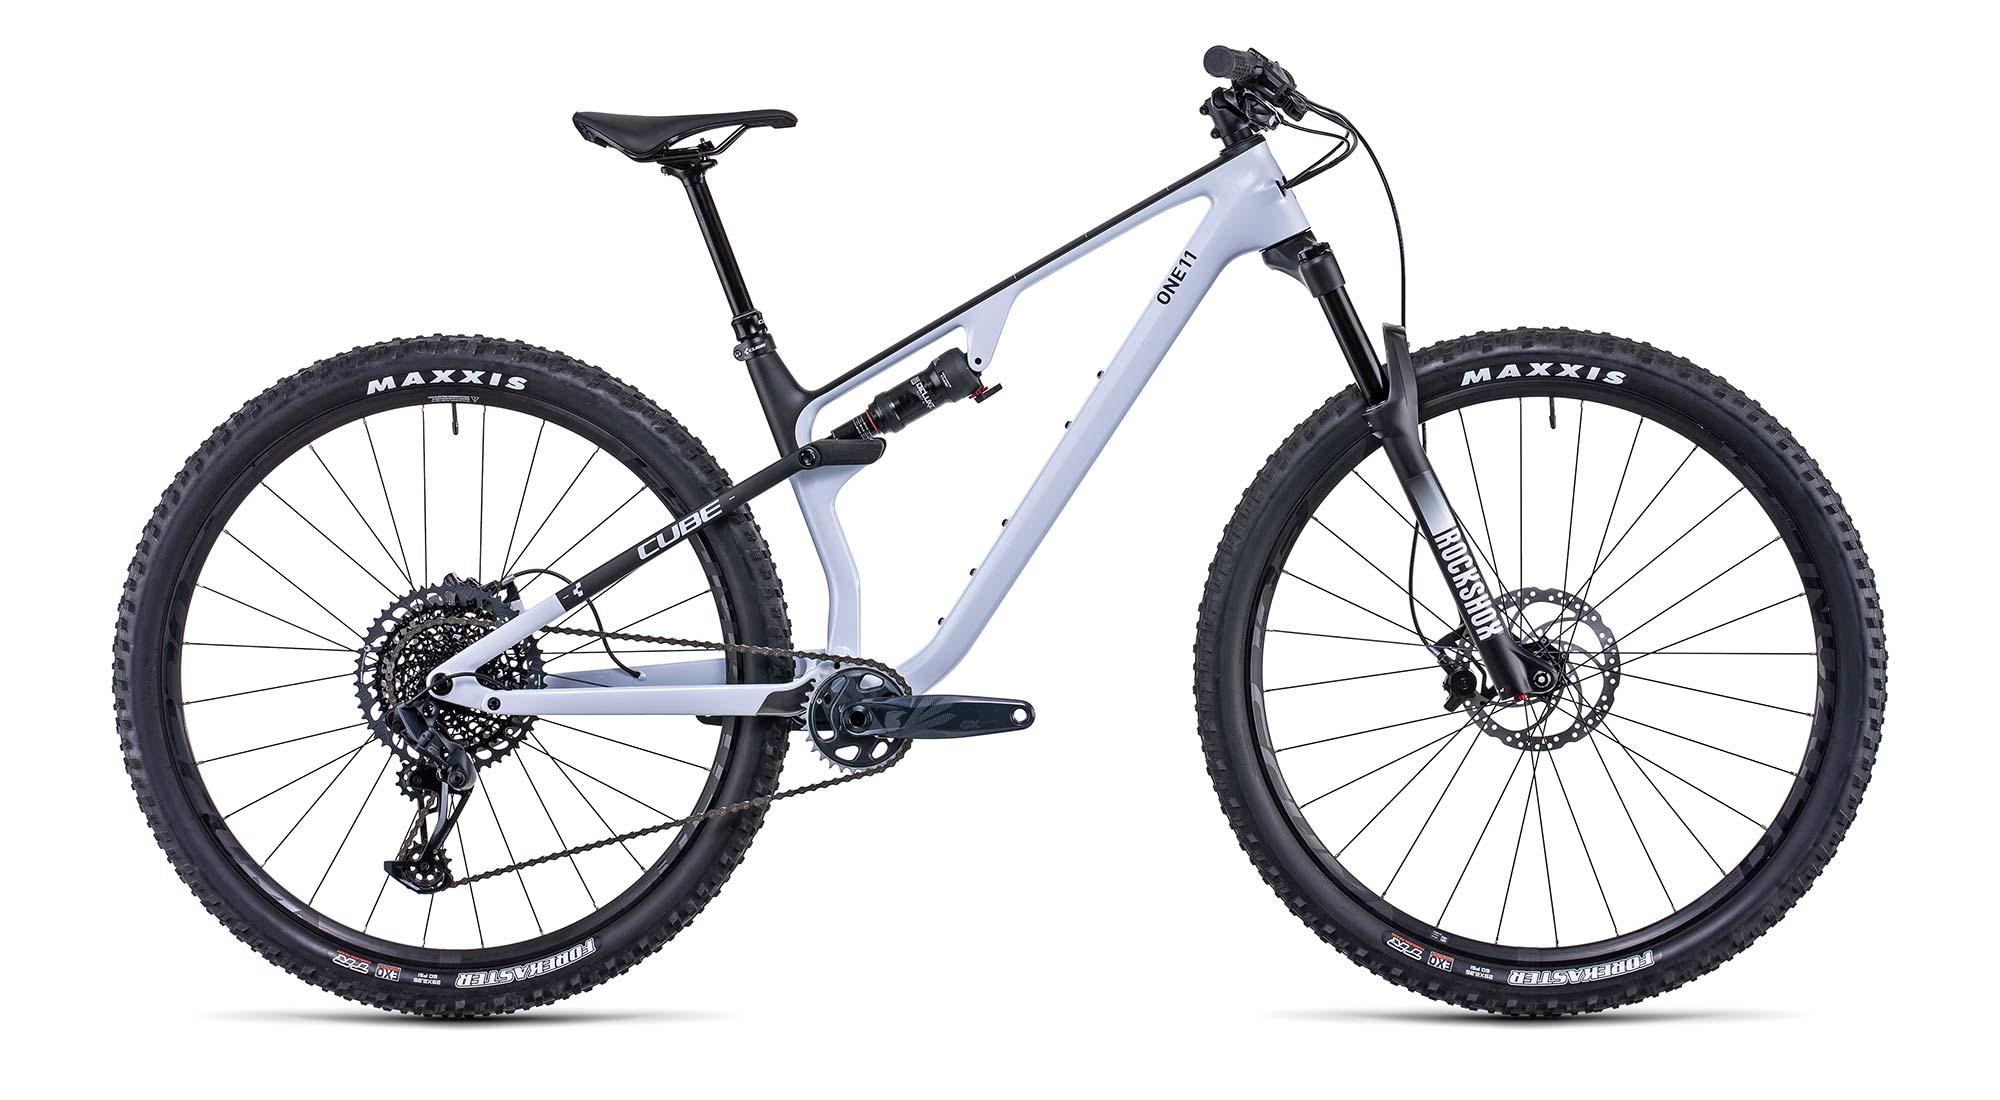 2022 Cube AMS One11 C:68X 29, lightweight carbon XC Marathon Trail mountain bike,Pro complete